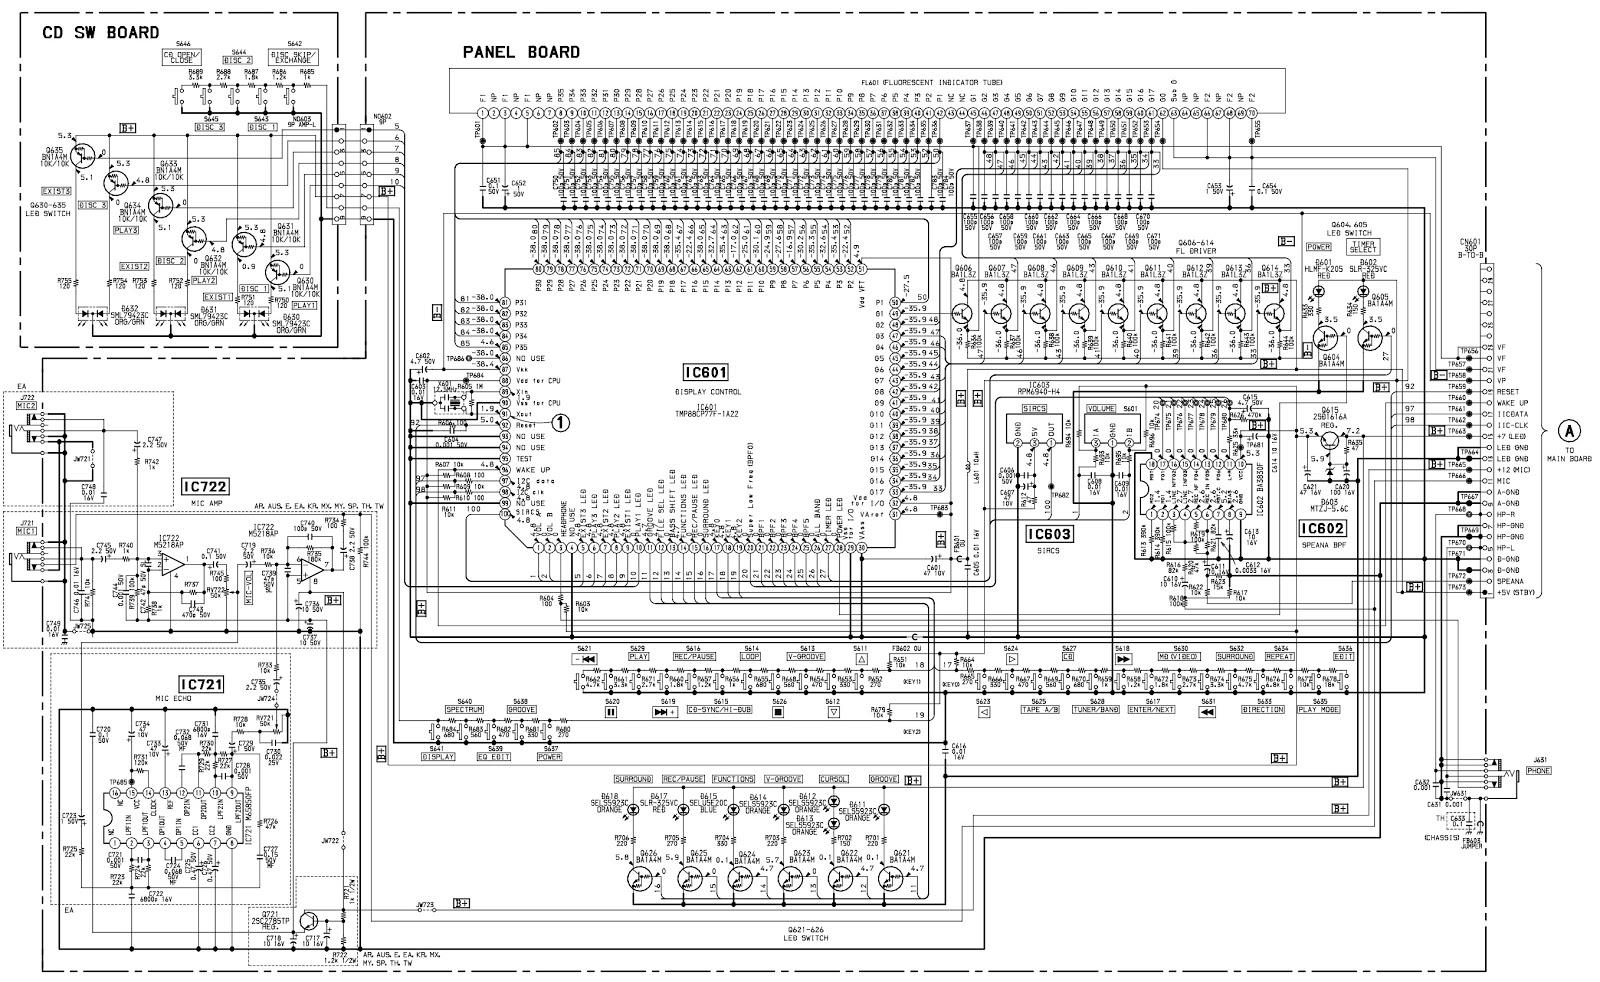 Sony Hcdbx5 Hcddx5 Hcddx5j Compact Disc Deck Receiver Panel Board Schematic Front Control Main